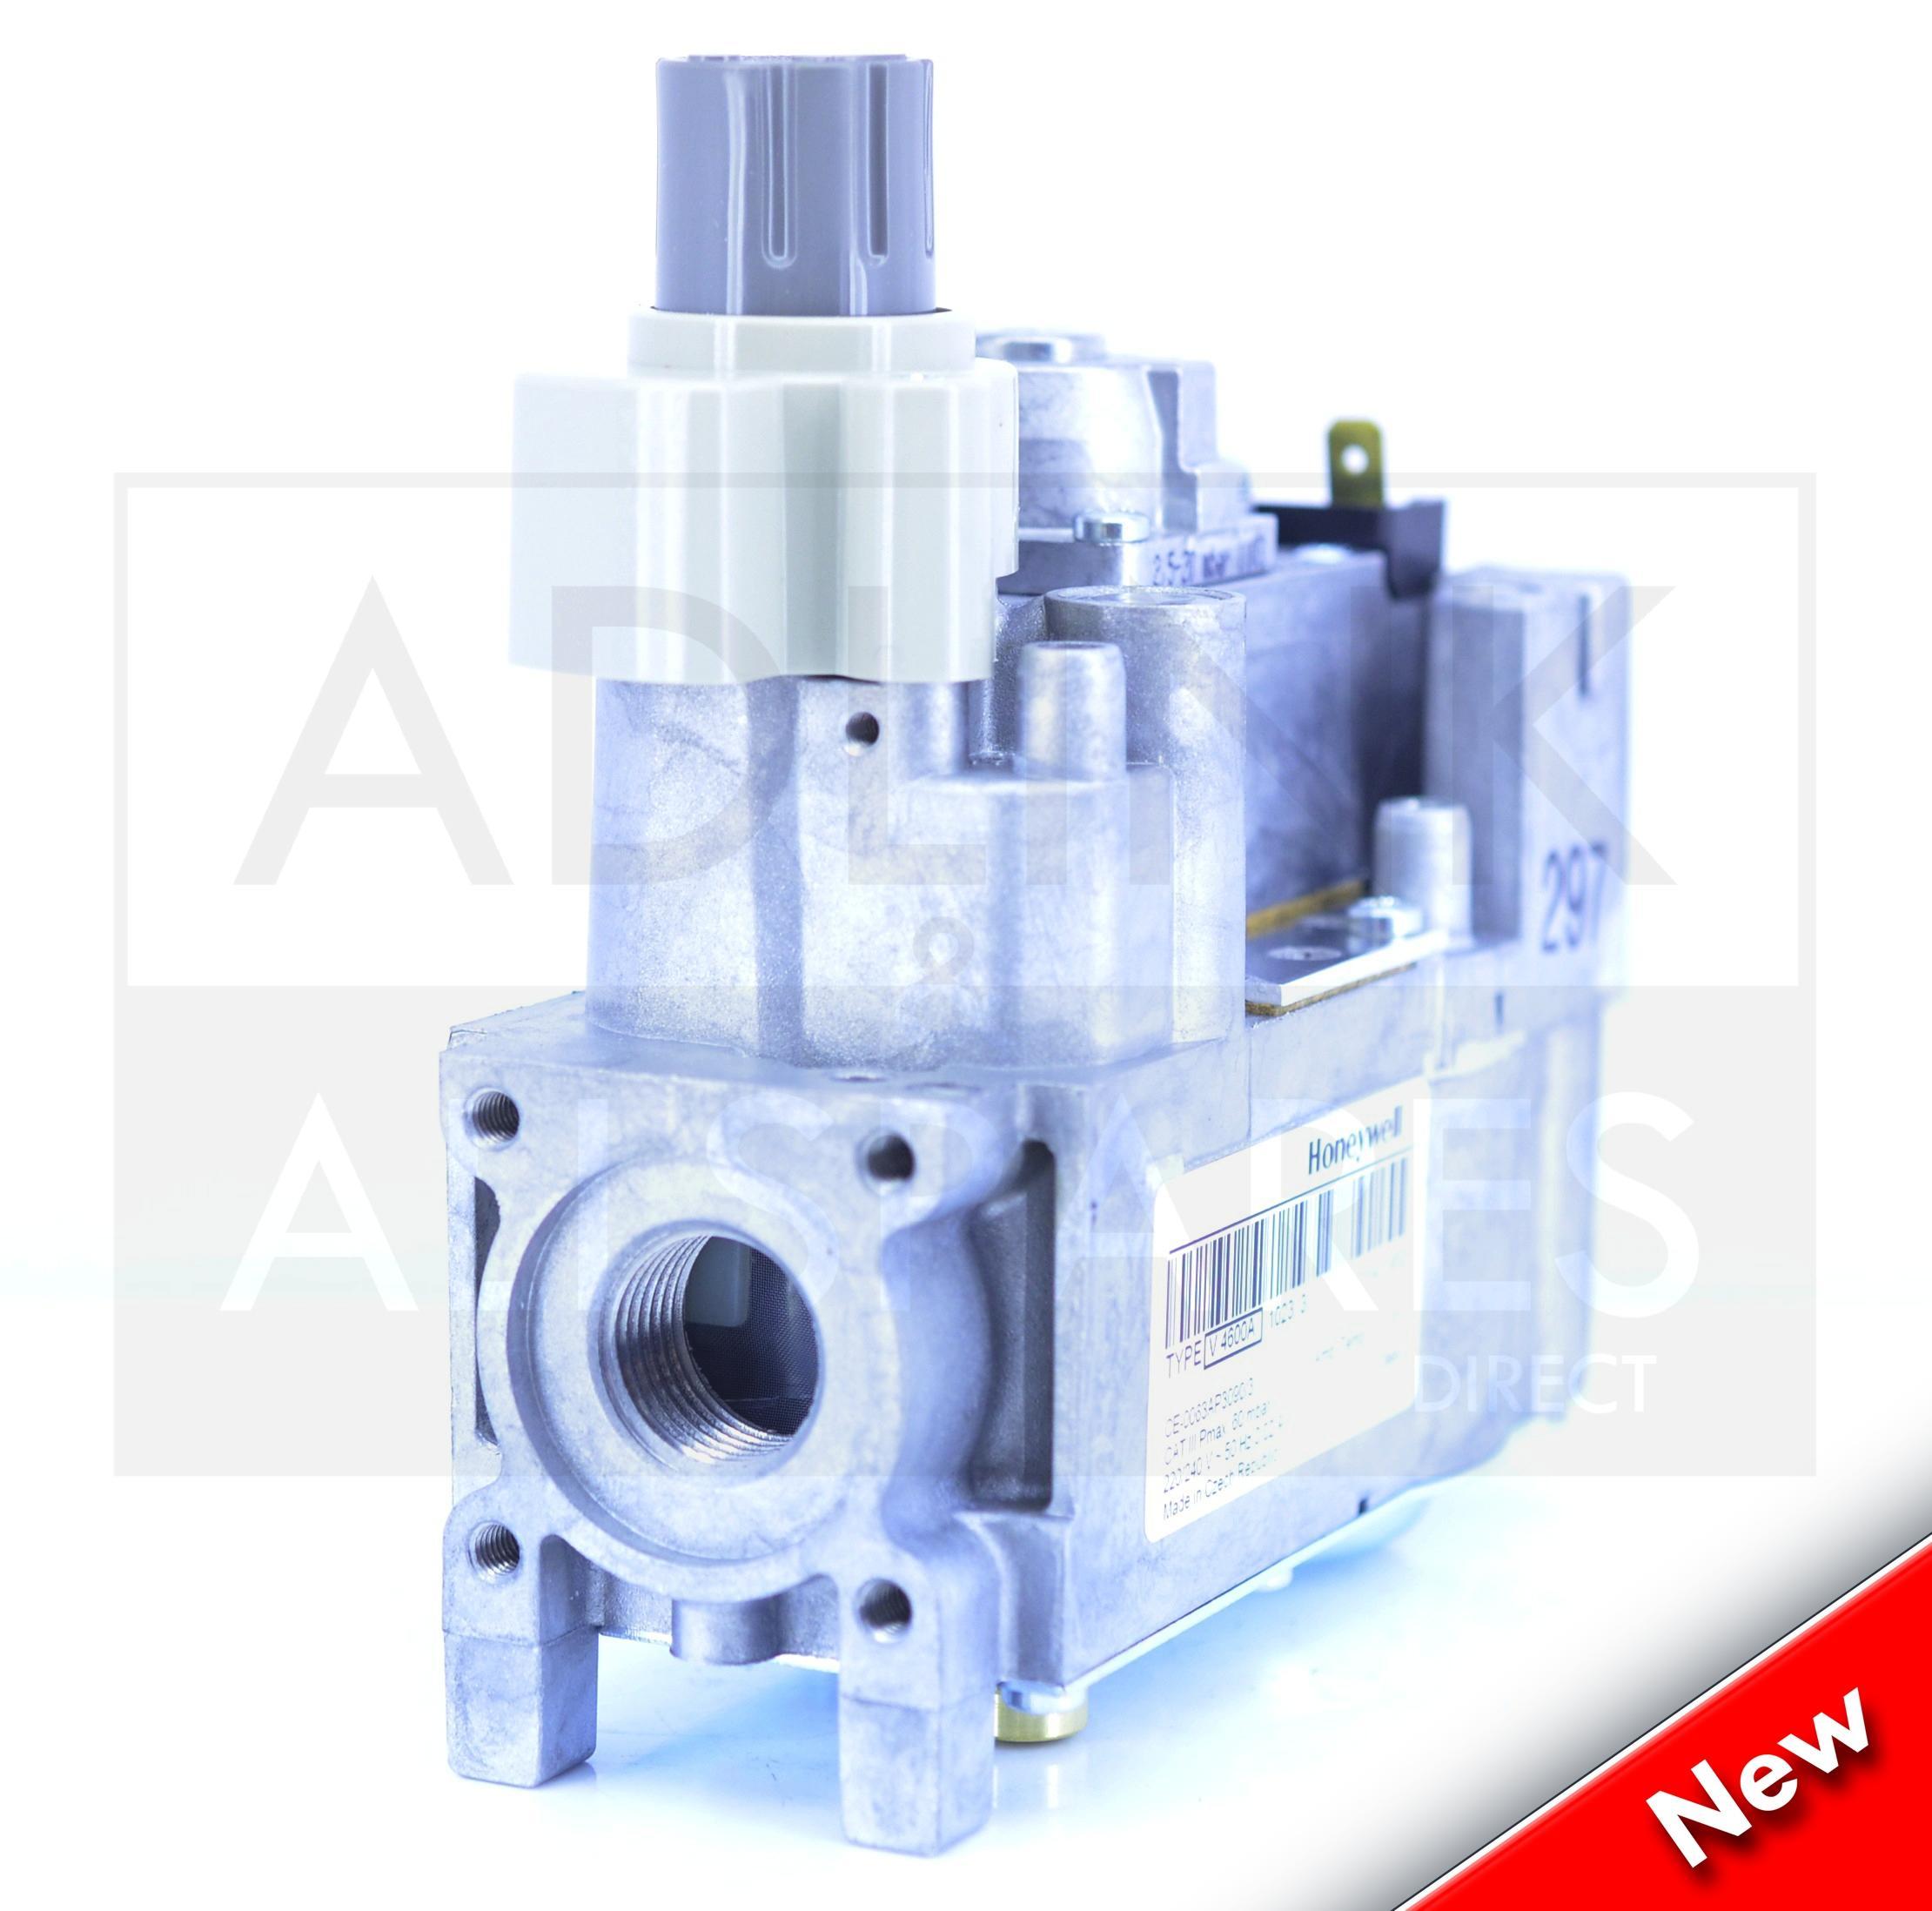 Ideal Concord WCF 240 A 240B 255 A /& WRS 230 A 240 A GAZ 255 A VALVE 003114